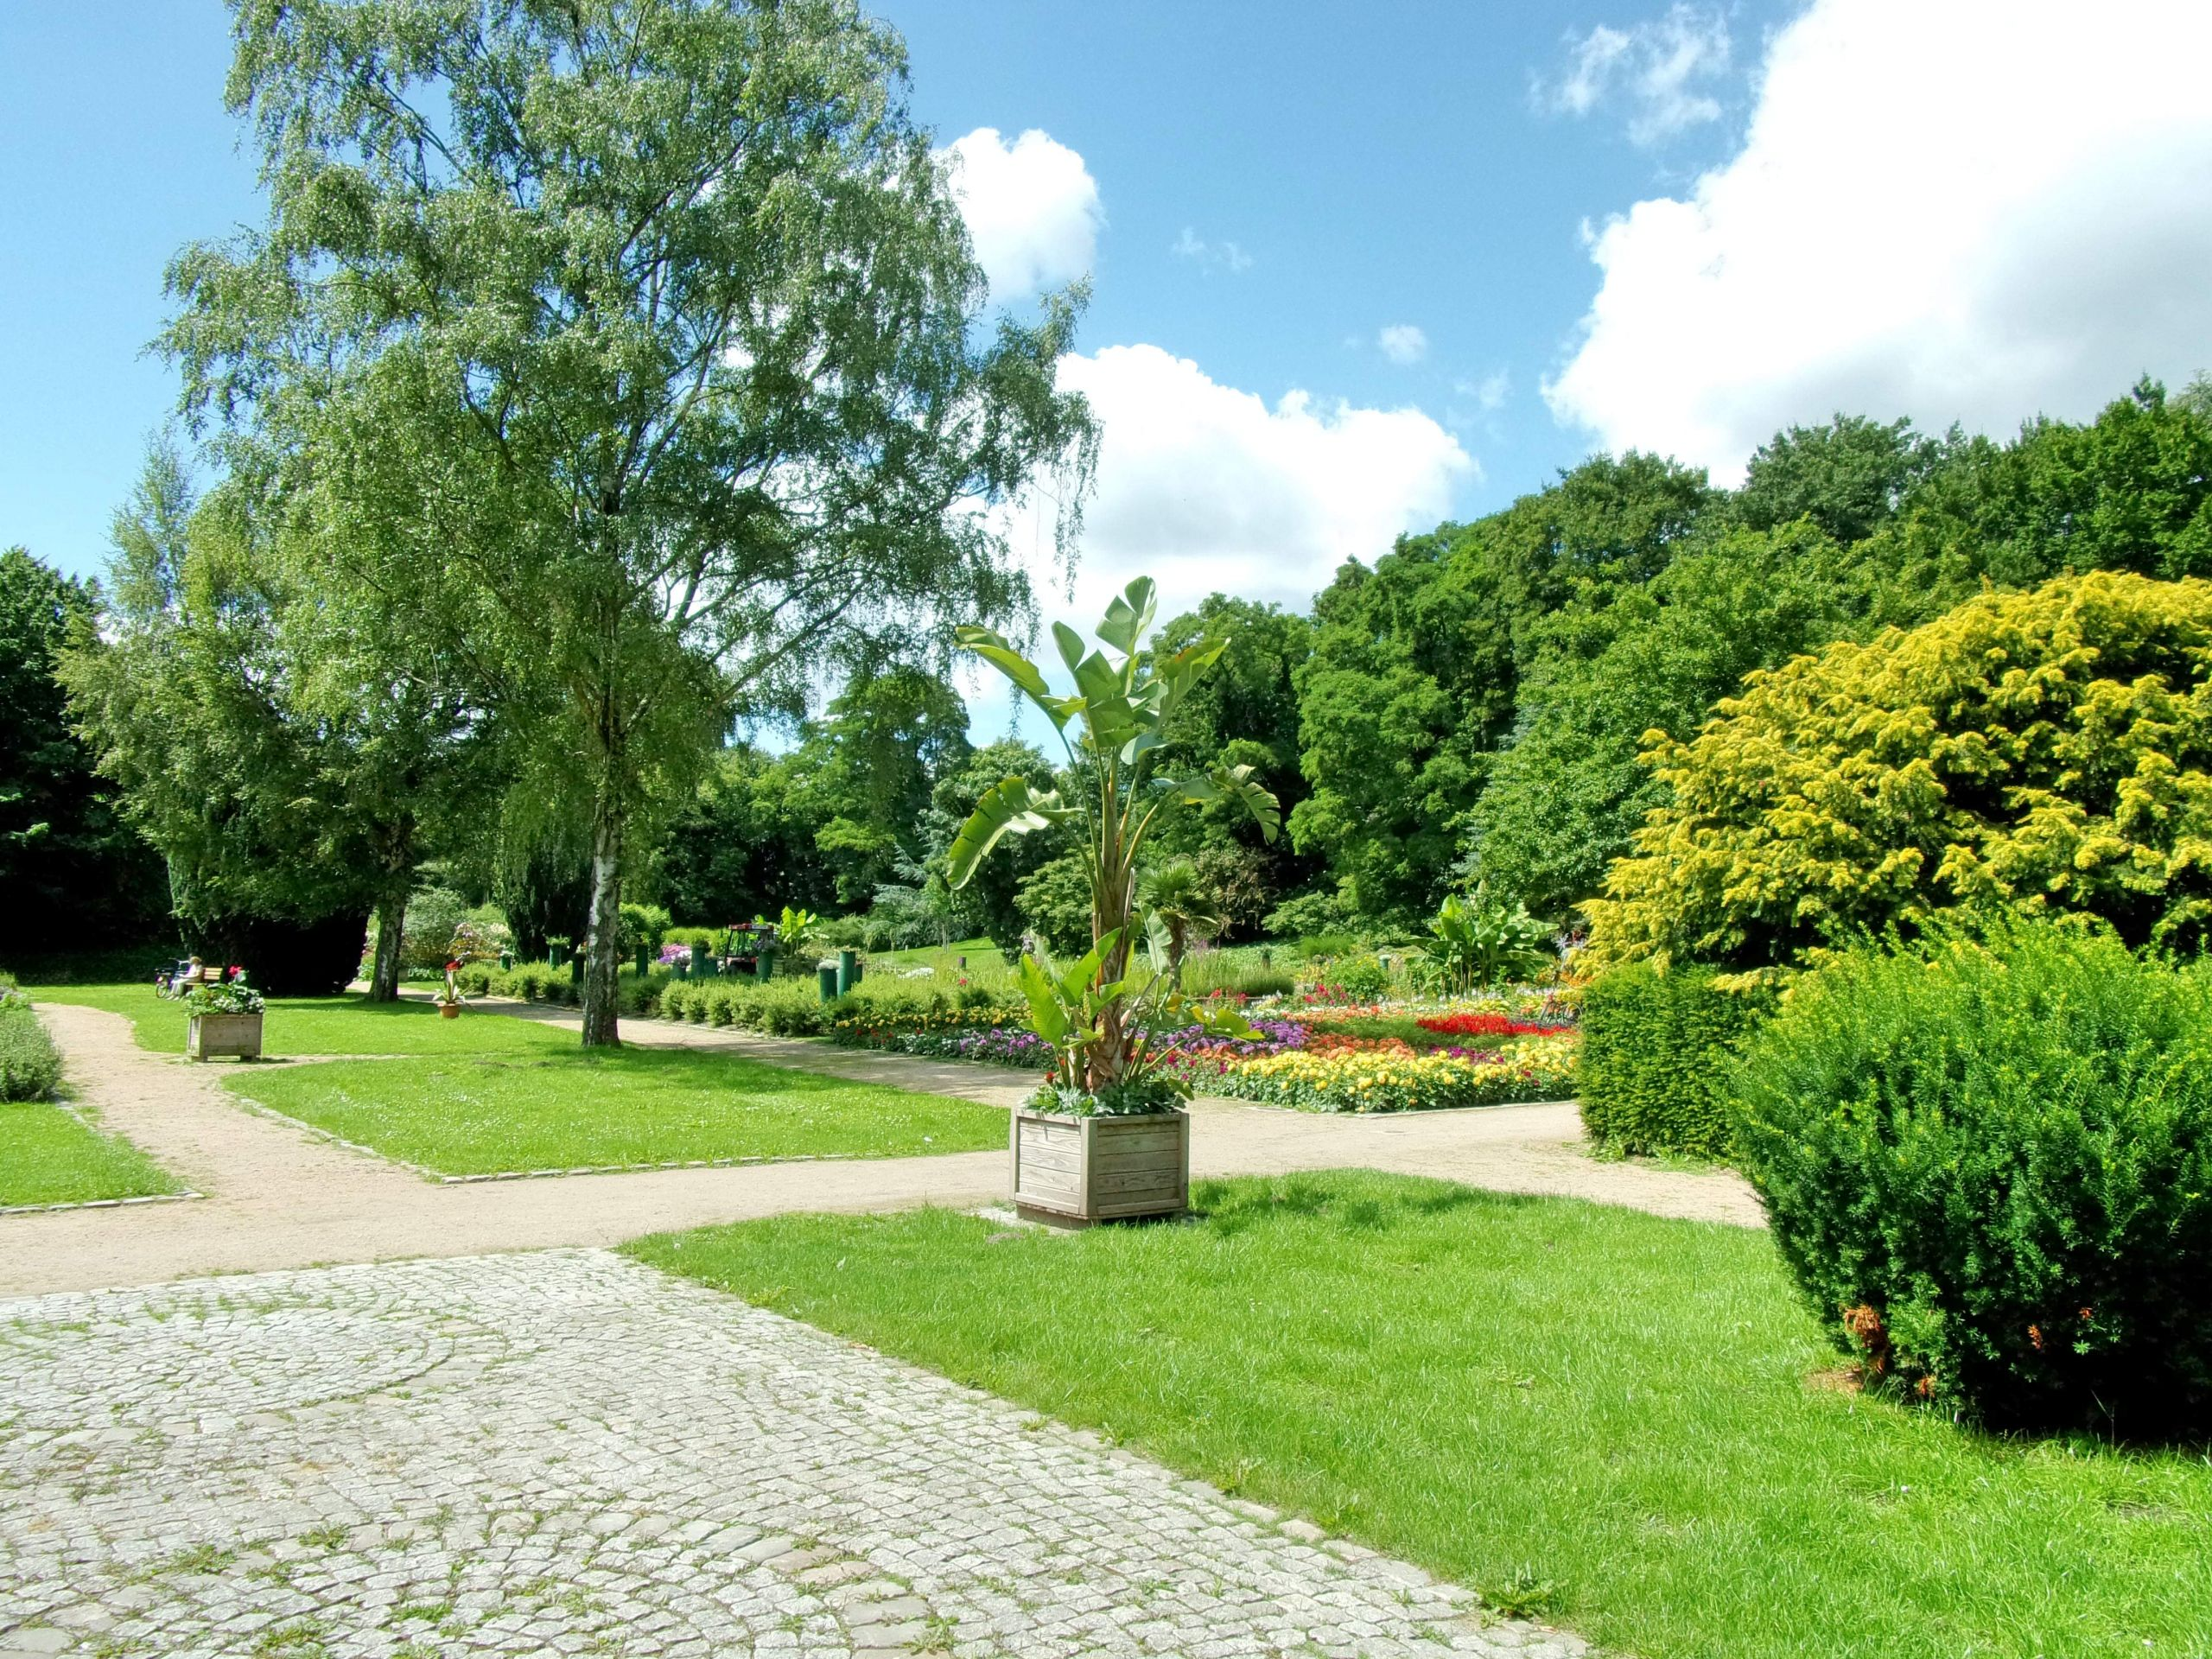 Loki Schmidt Garten Hamburg Reizend Botanischer sondergarten Wandsbek –